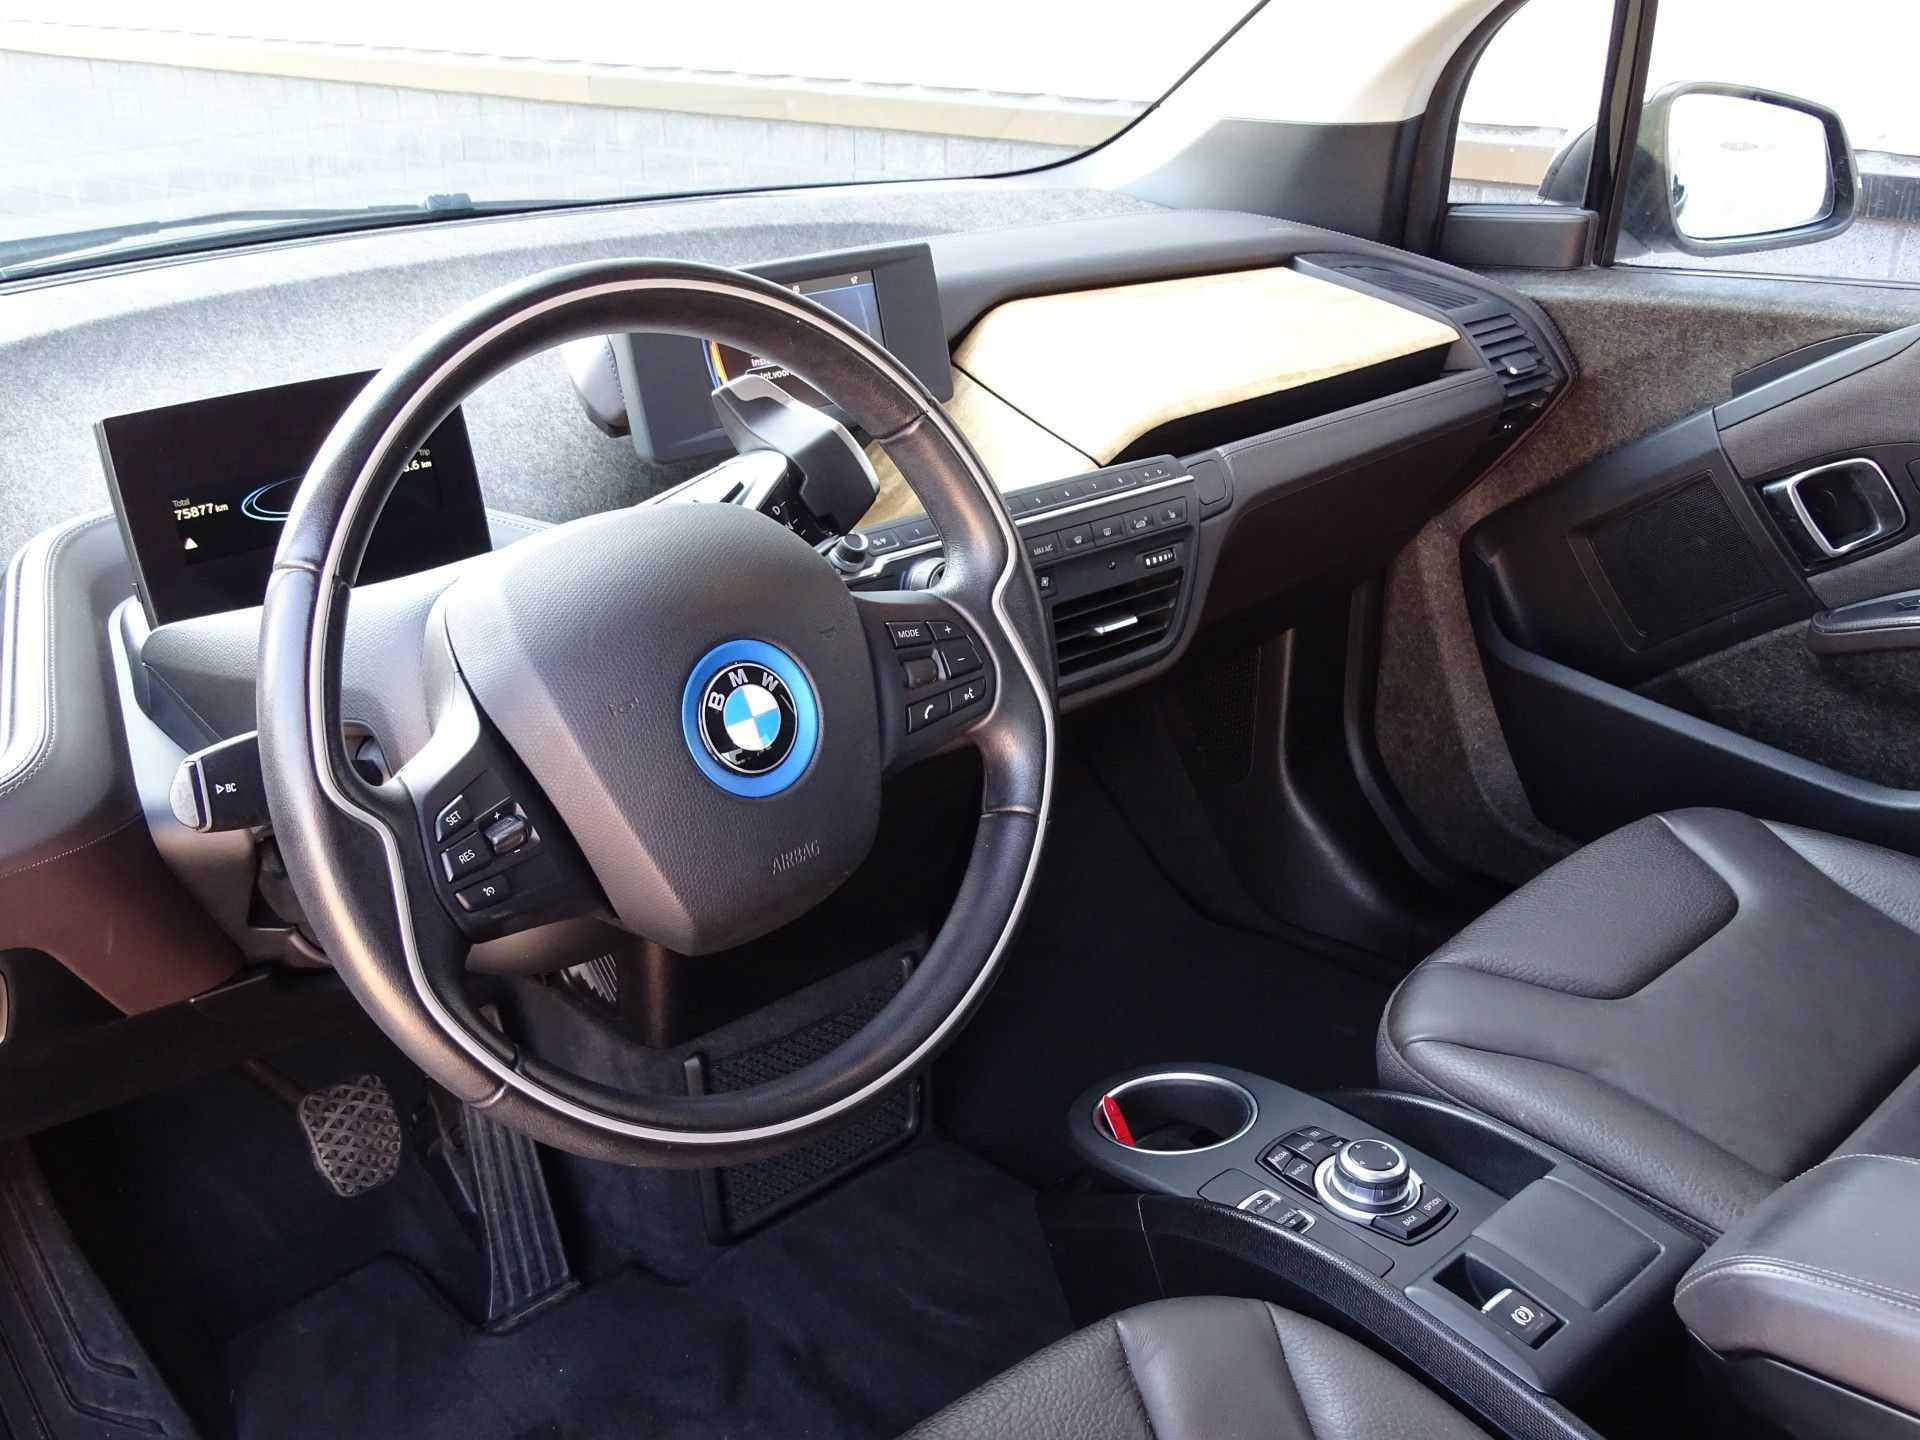 BMW i3 Basis Comfort Advance 22 kWh Marge Warmtepomp Navigatie Clima Cruise Panorama afbeelding 14